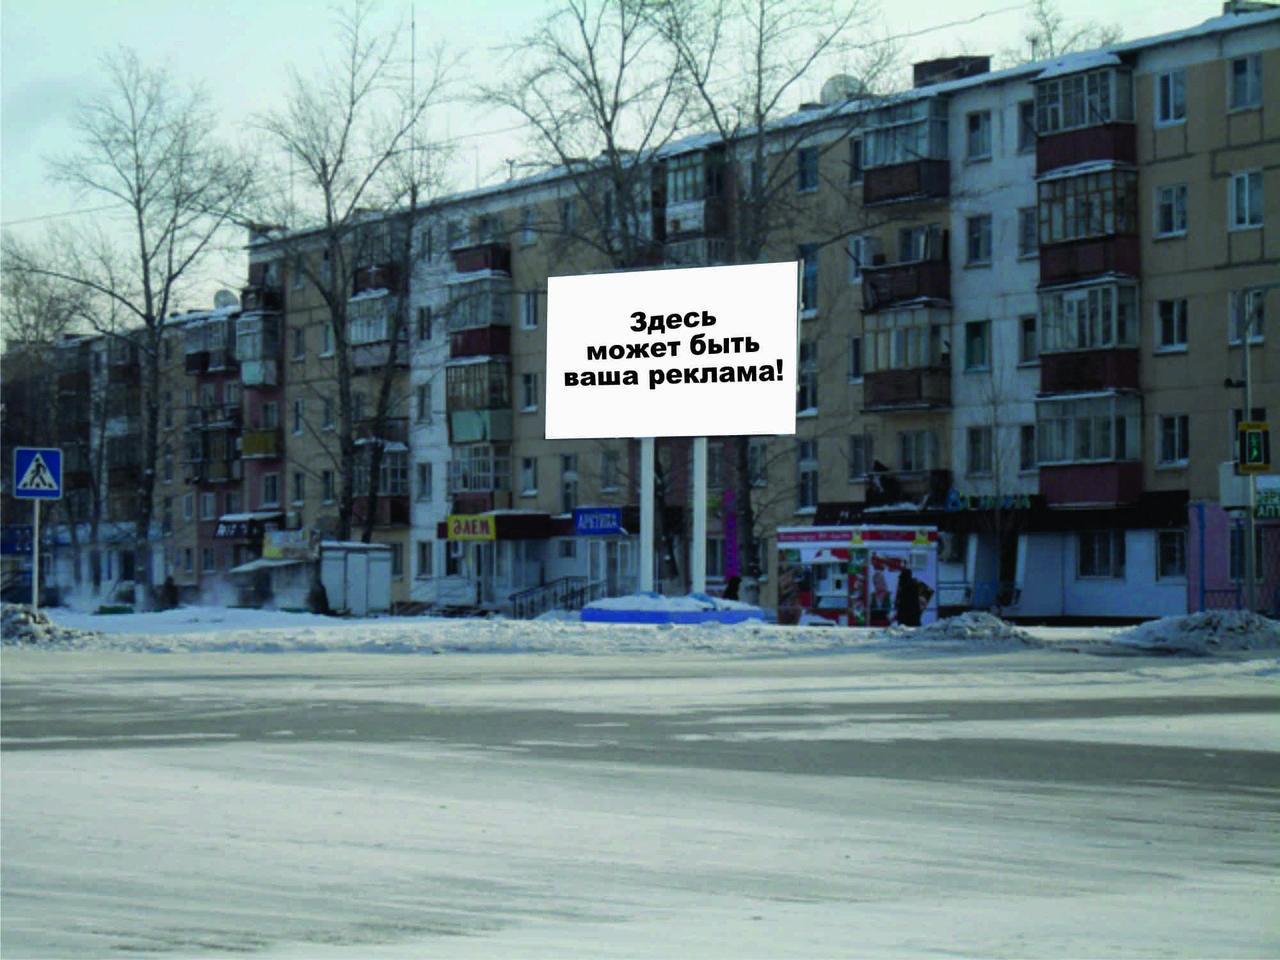 Аренда билборда 6х3 метра в Рудном